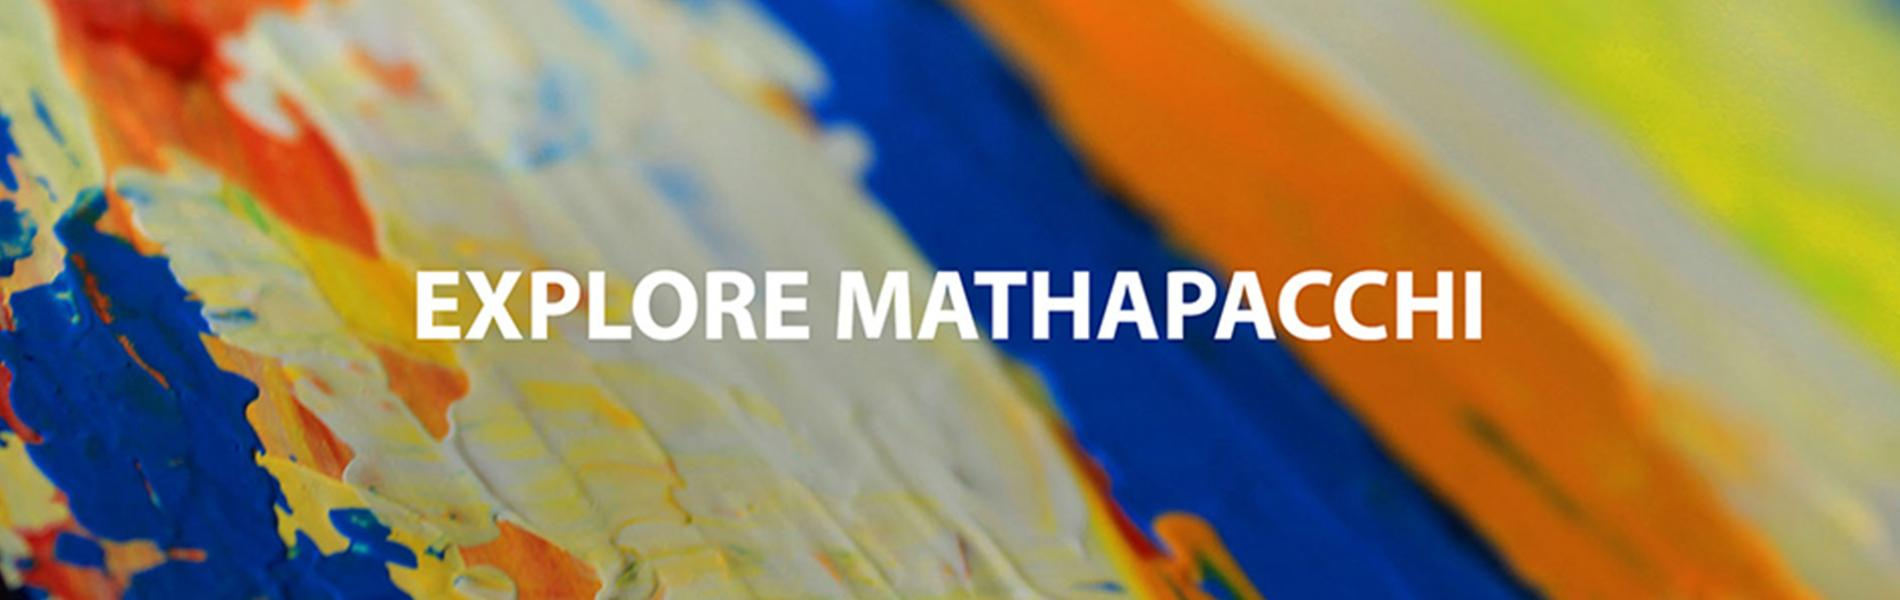 Mathapacchi by Swati Chauhan